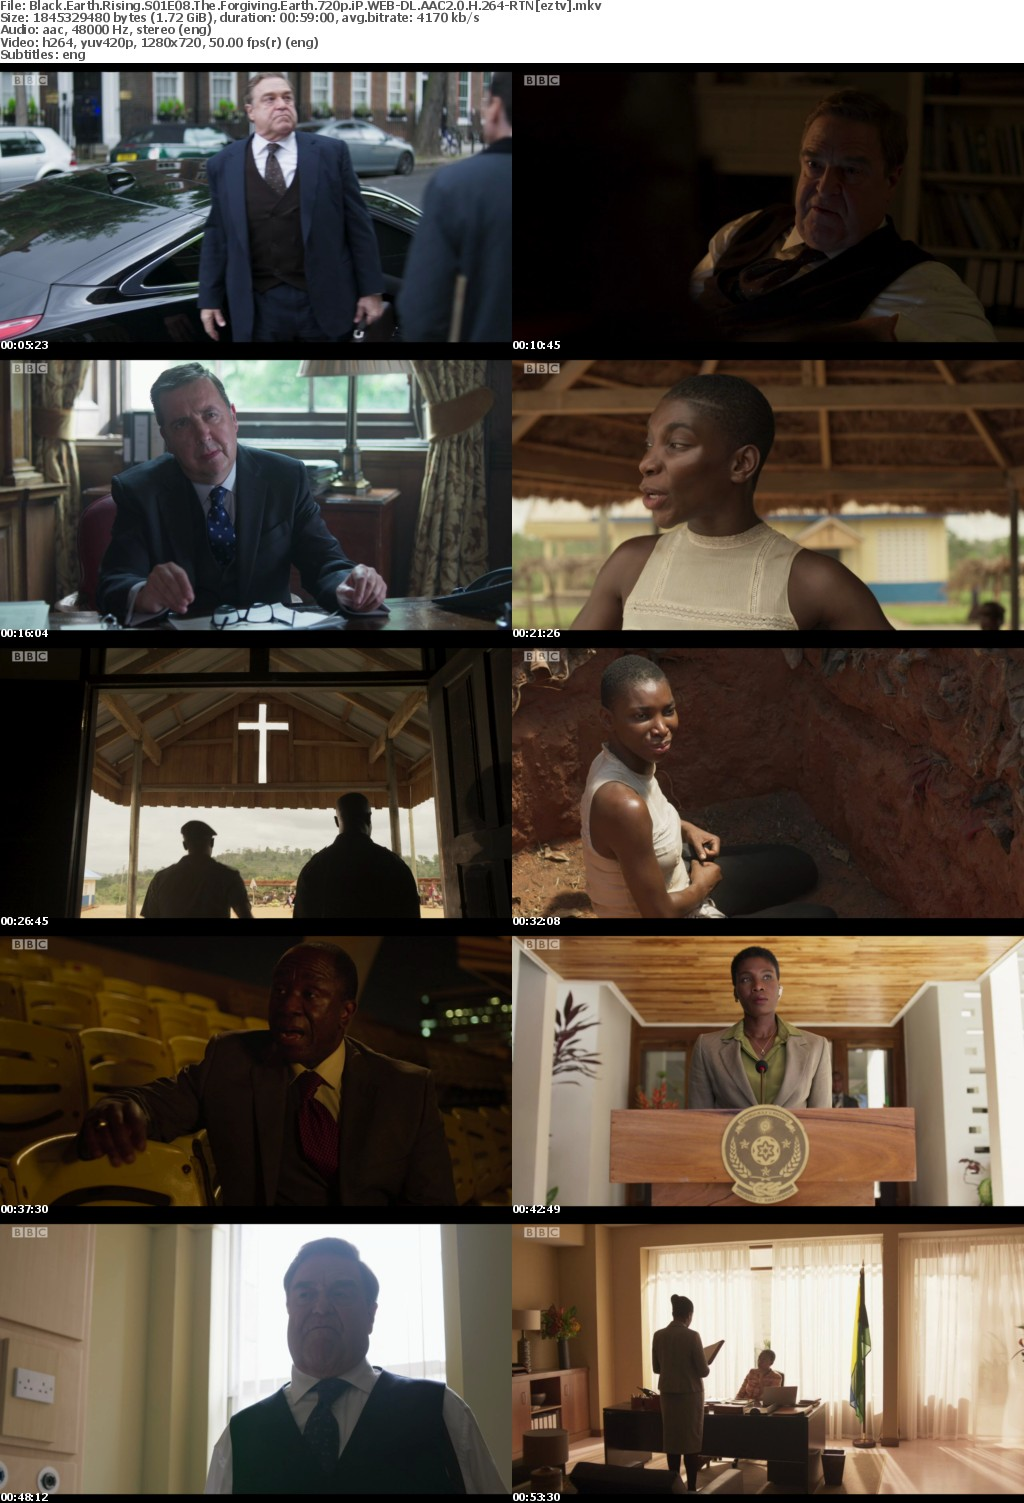 Black Earth Rising S01E08 The Forgiving Earth 720p iP WEB-DL AAC2.0 H264-RTN